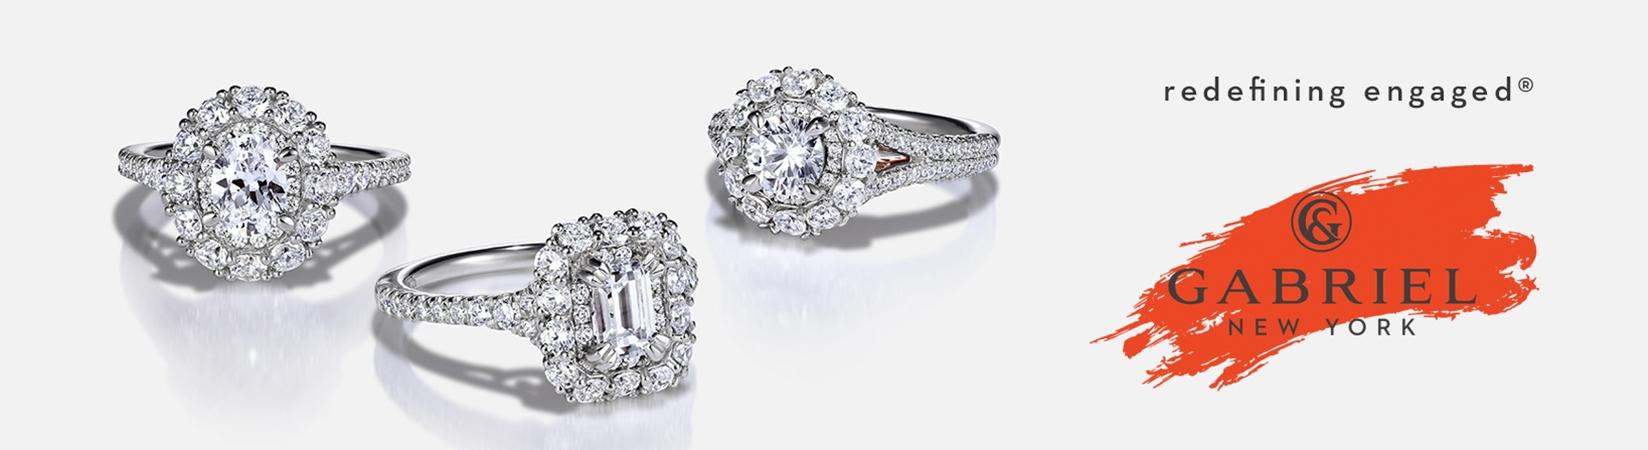 Gabriel engagement ring